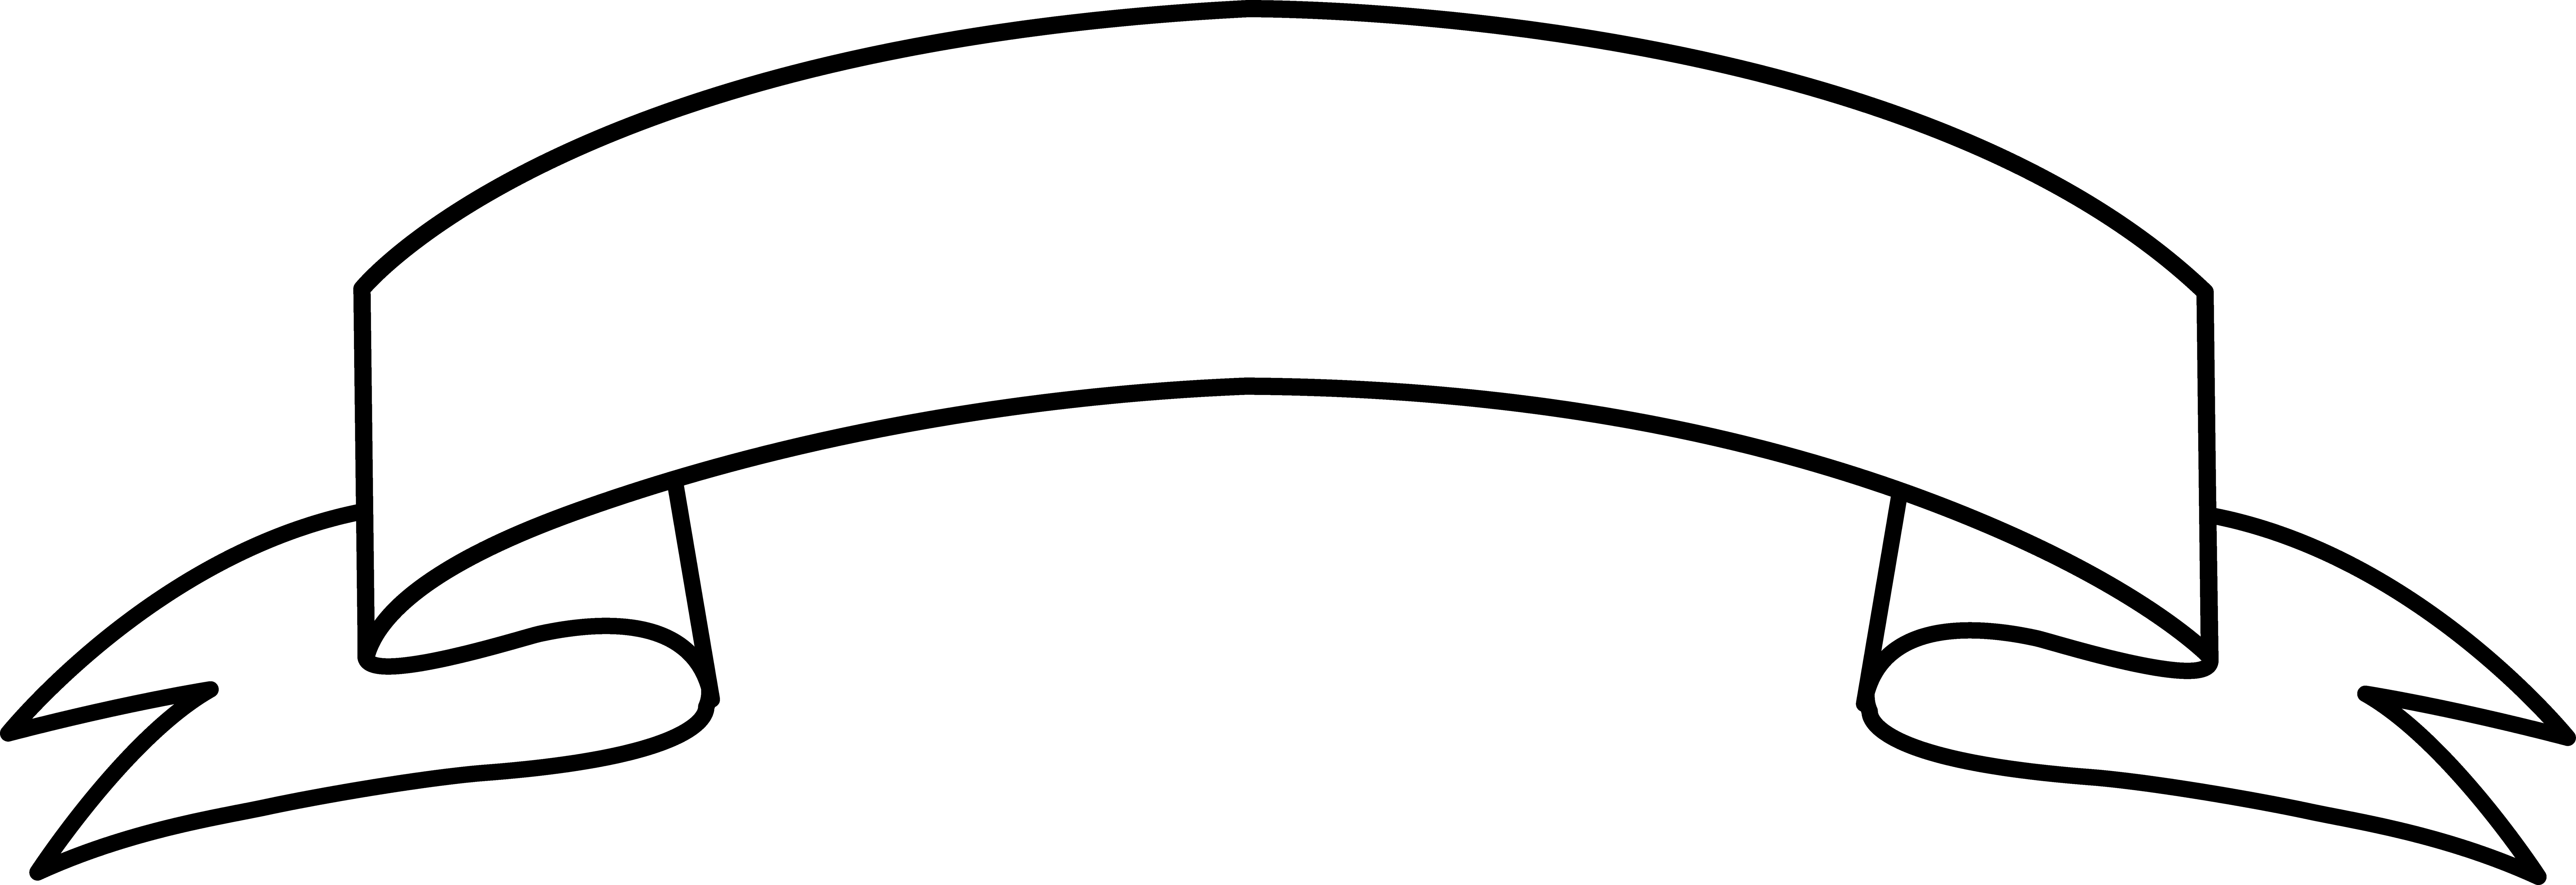 11201x3847 Scroll Clipart Ribbon Banner